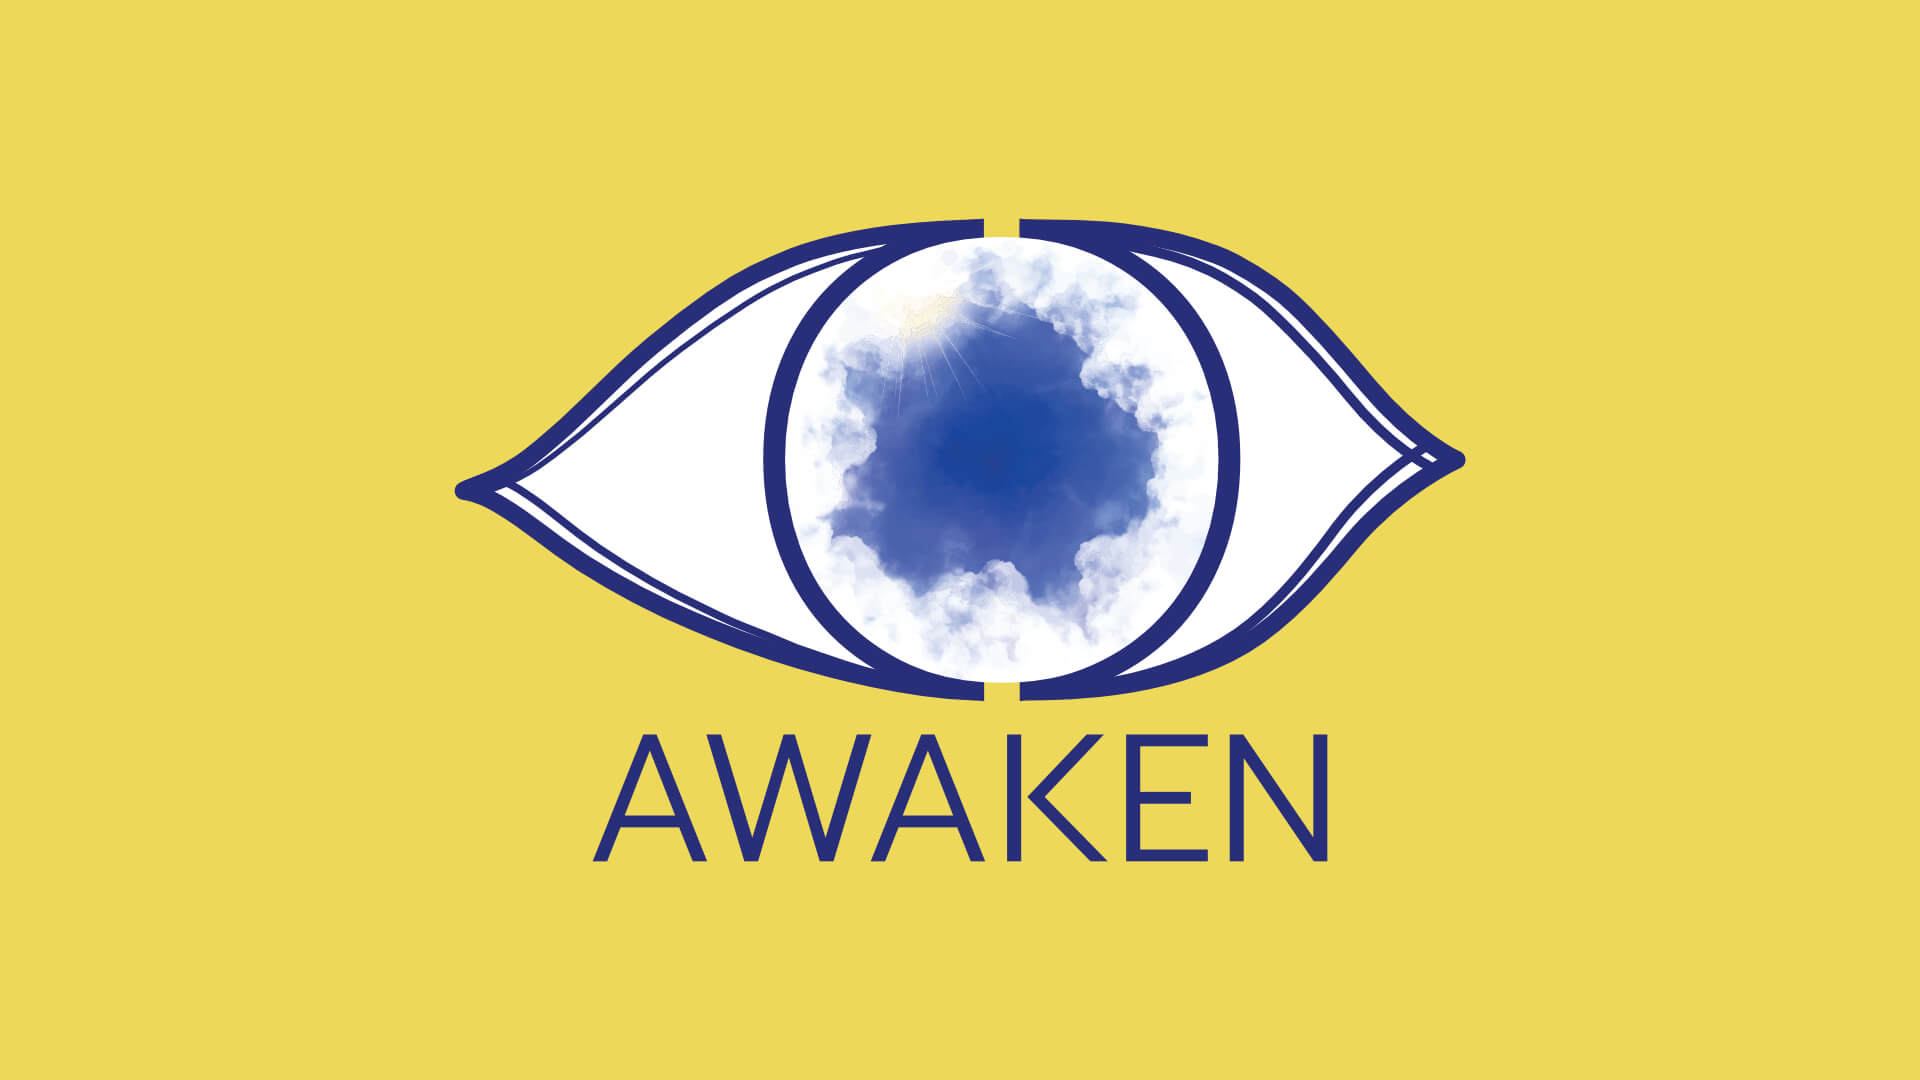 AWAKEN TO THE KINGDOM OF HEAVEN